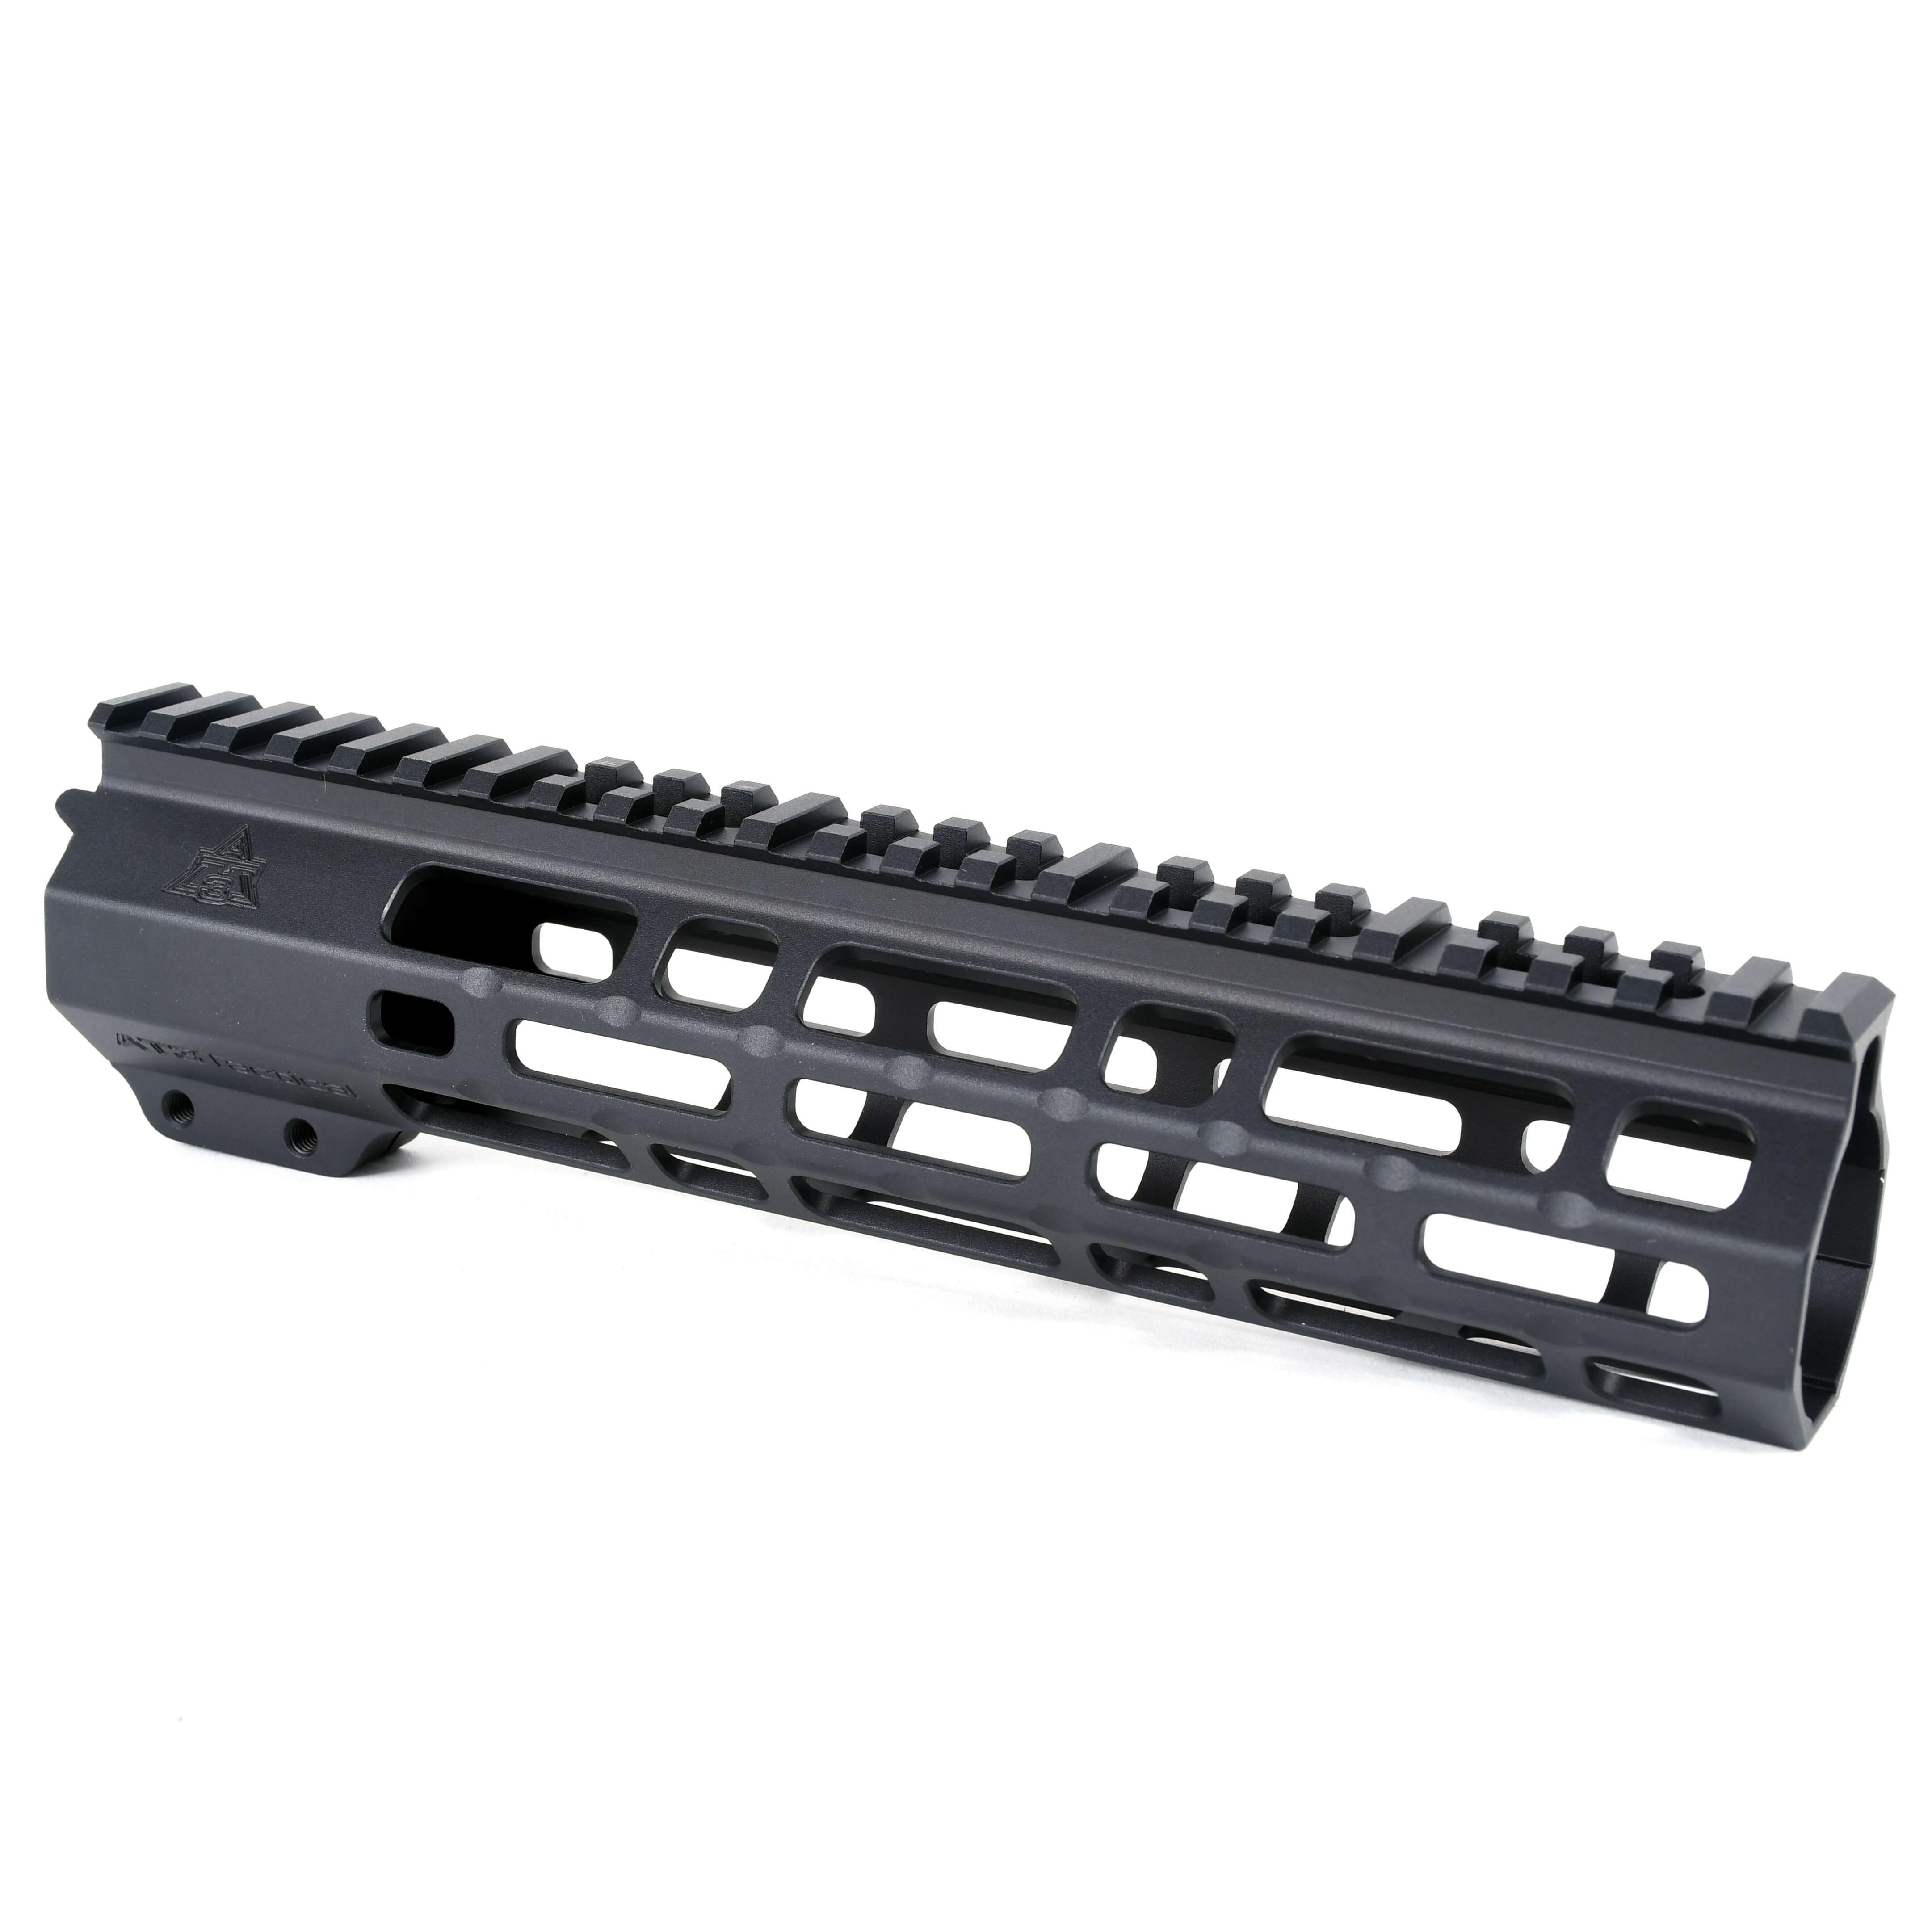 AT3™ M Lok Handguard | Spear M-Lok for AR-15 – 9, 12, & 15 inch Lengths